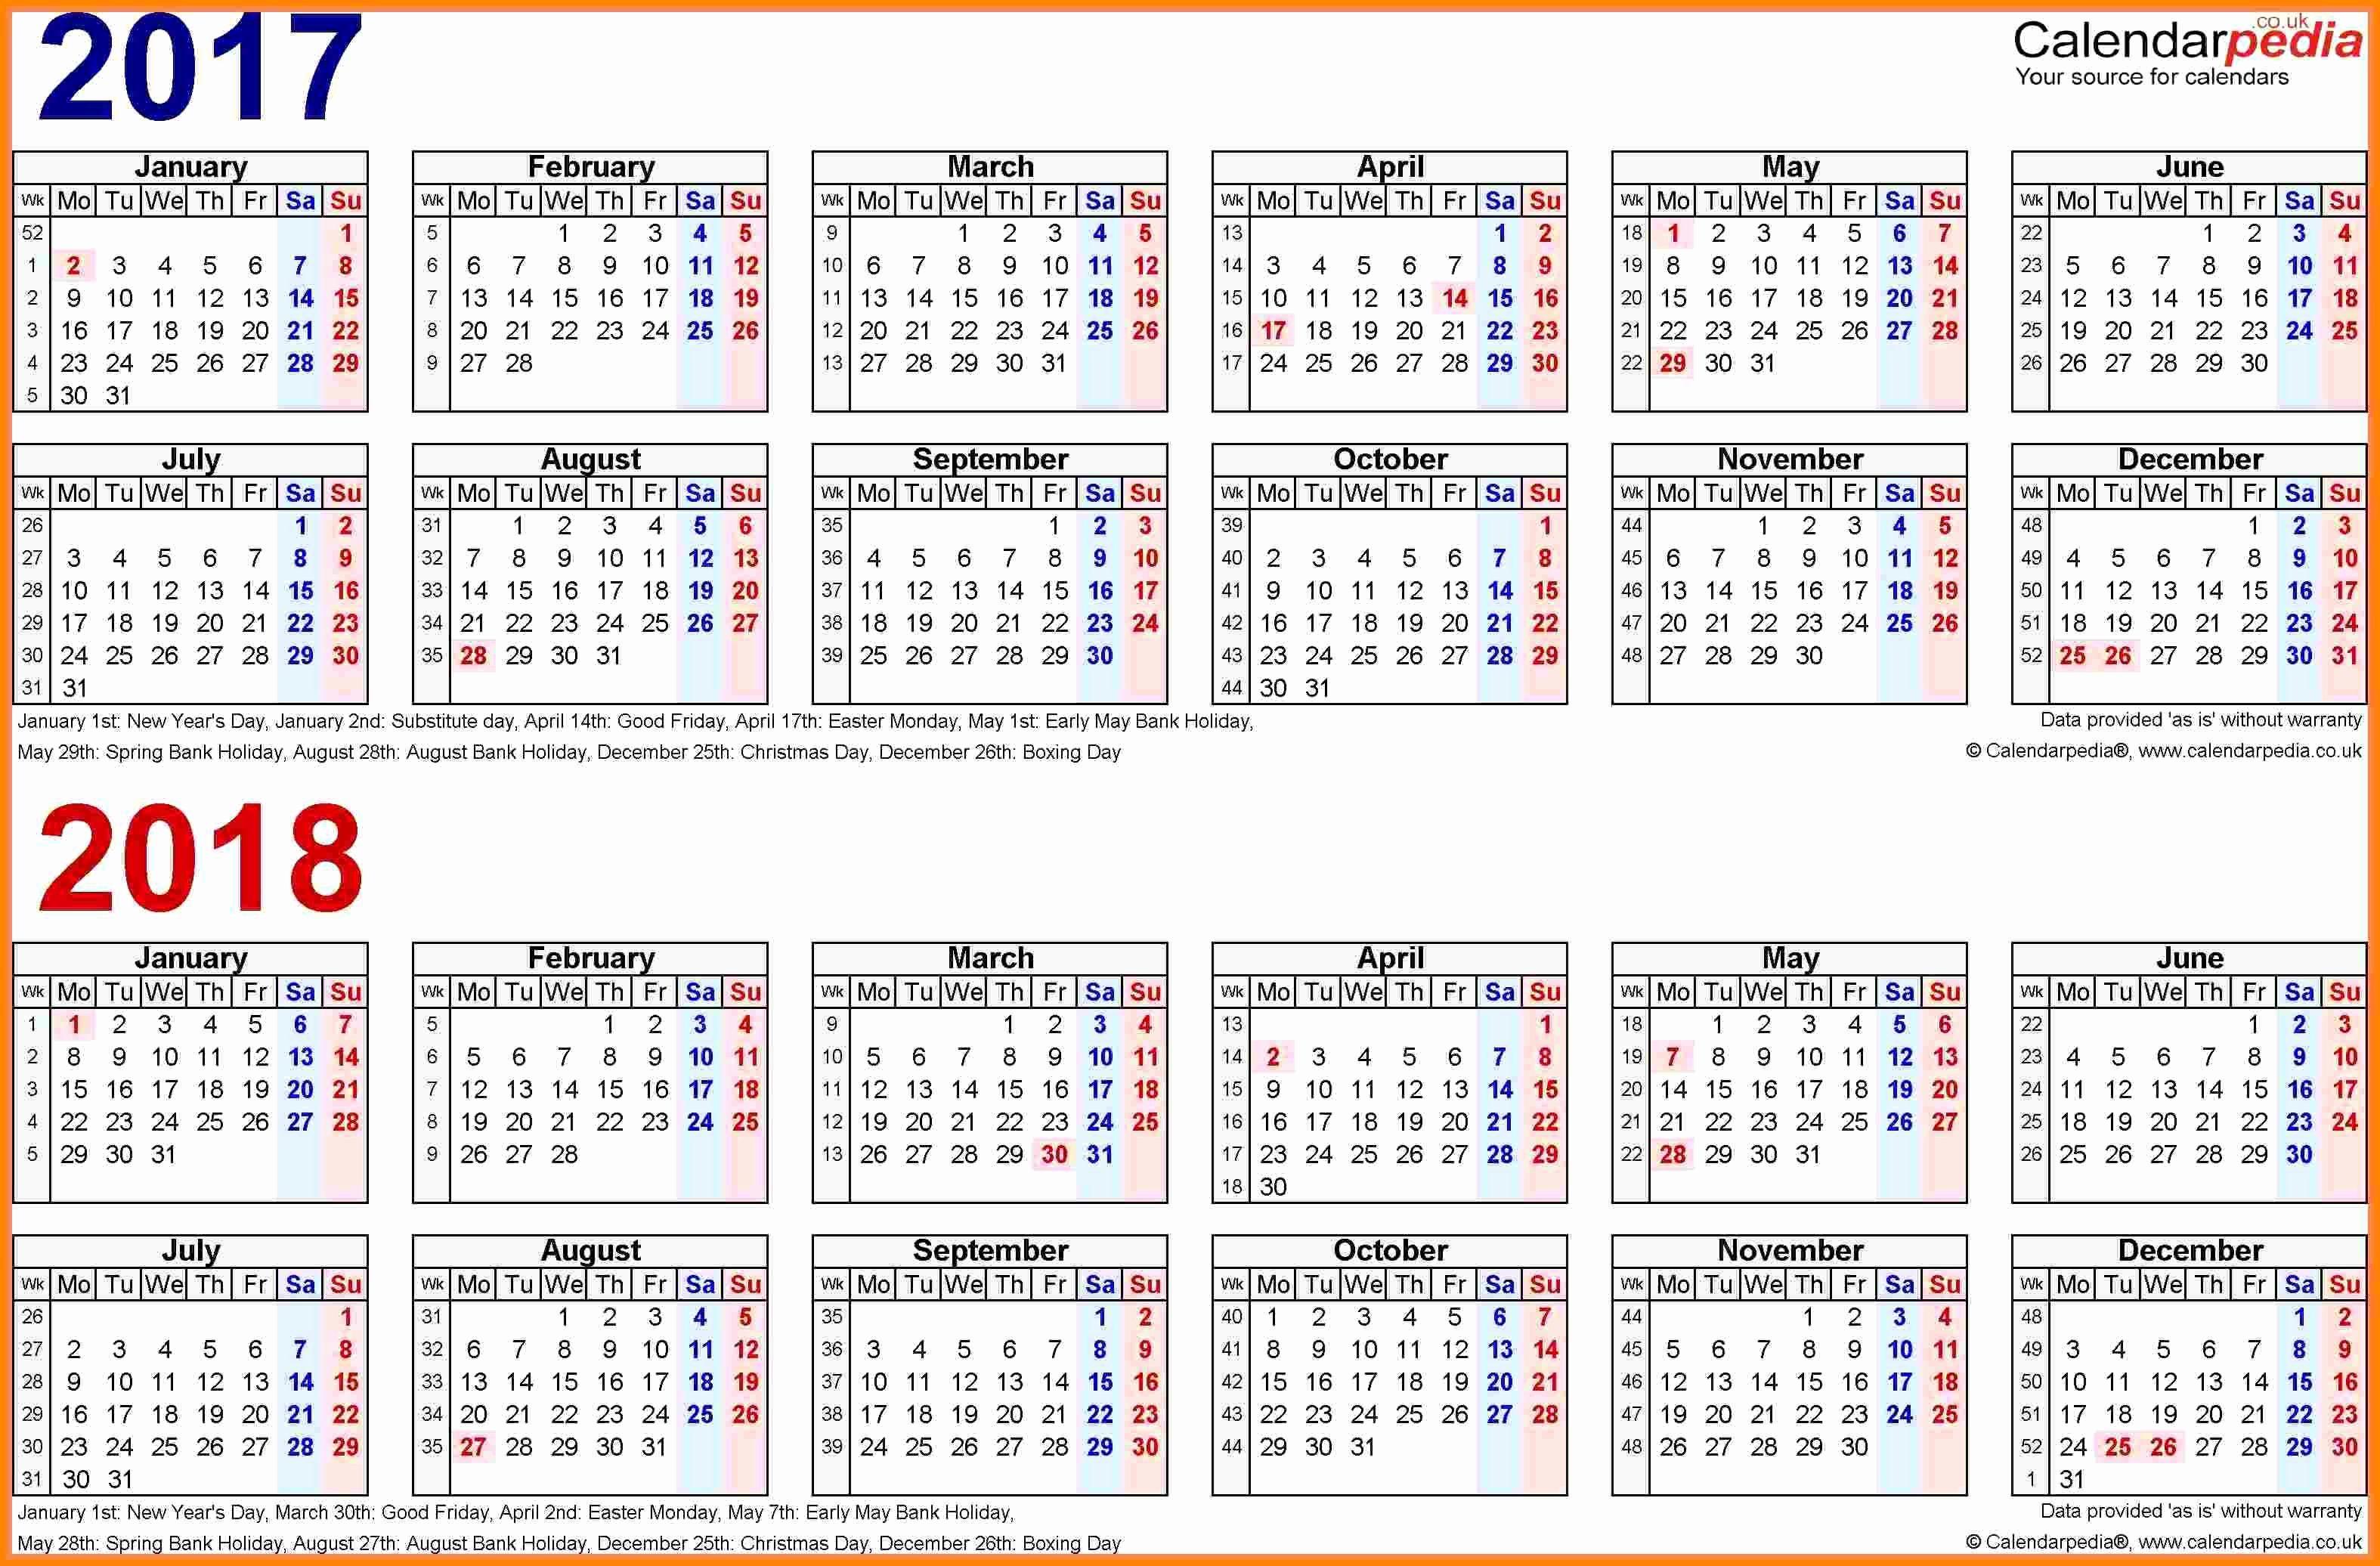 Biweekly Pay Schedule Template Lovely 7 Bi Weekly Payroll Calendar